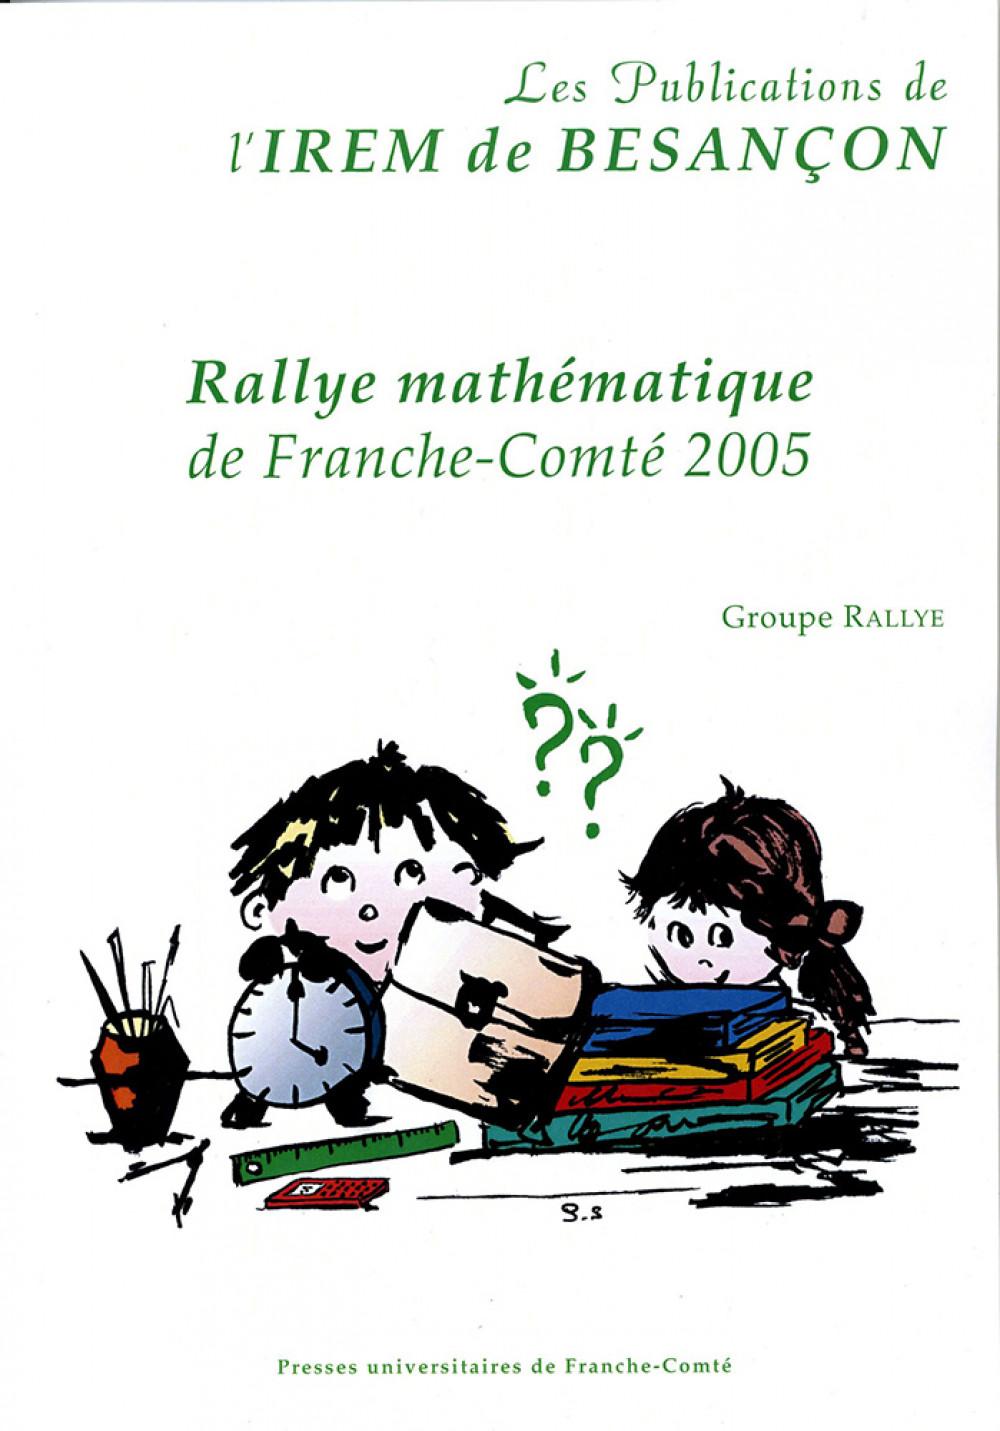 Rallye mathématique de Franche-Comté 2005